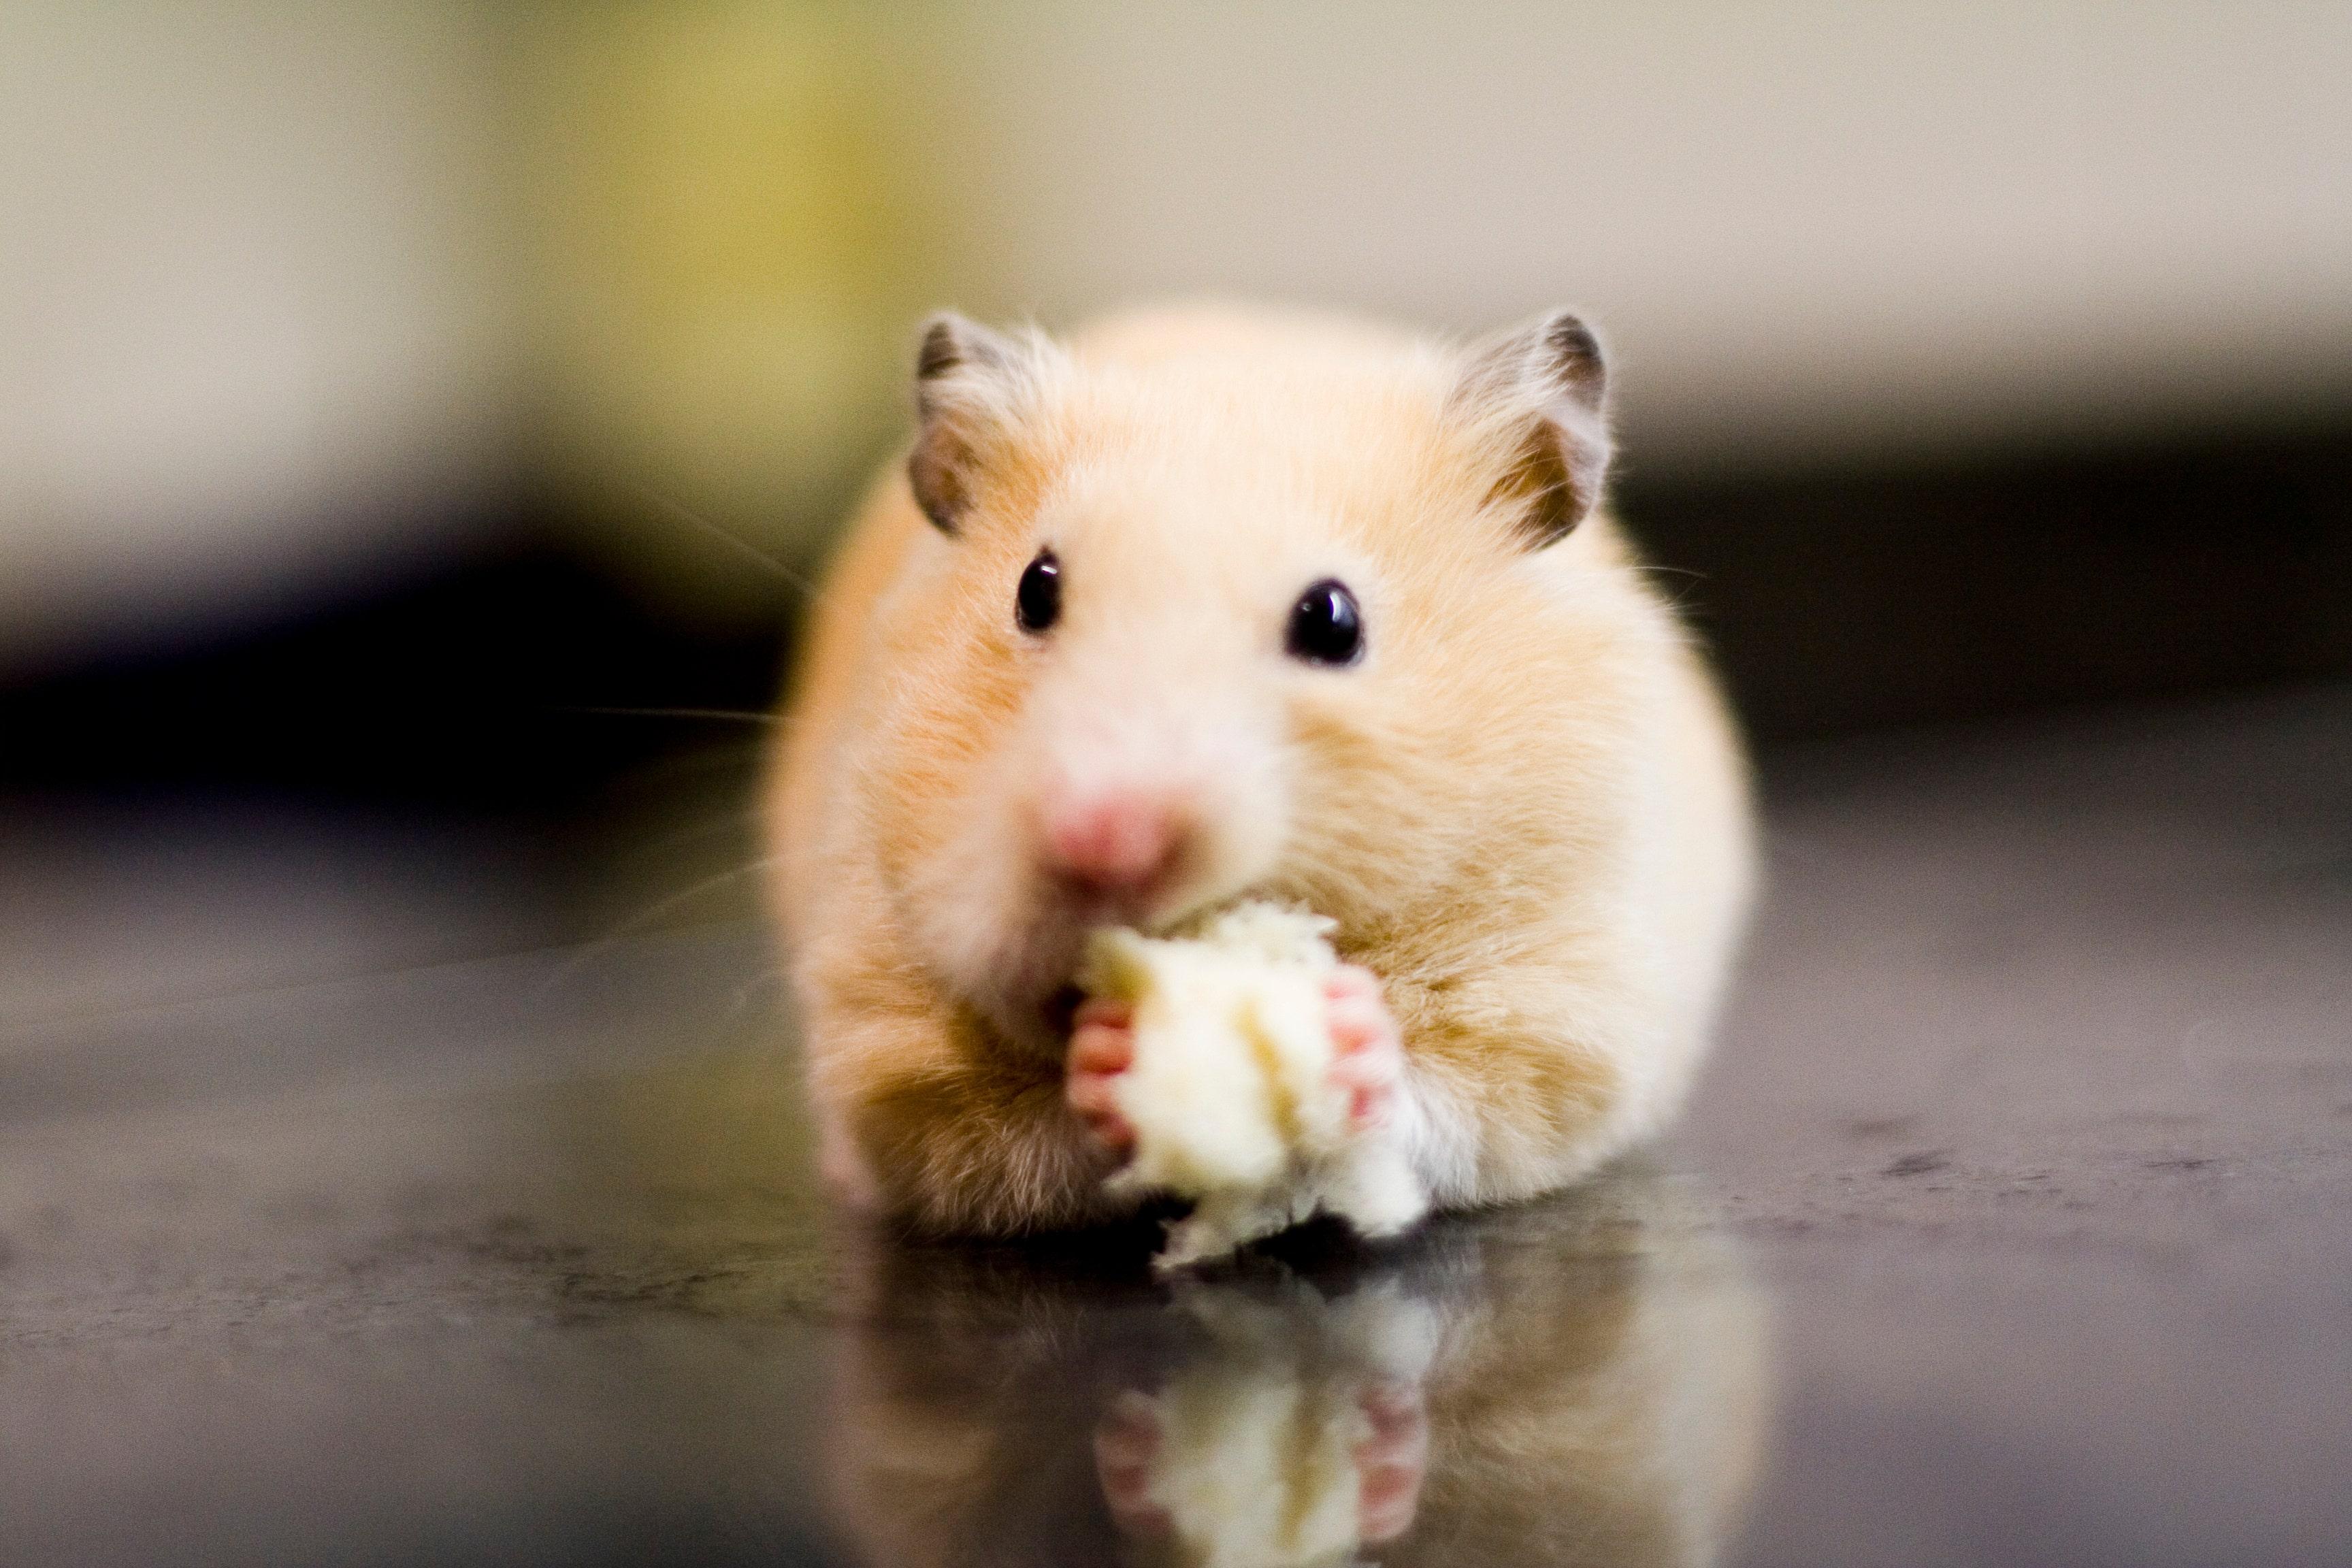 Inhaled nanobodies effective against coronavirus in hamsters, researchers say